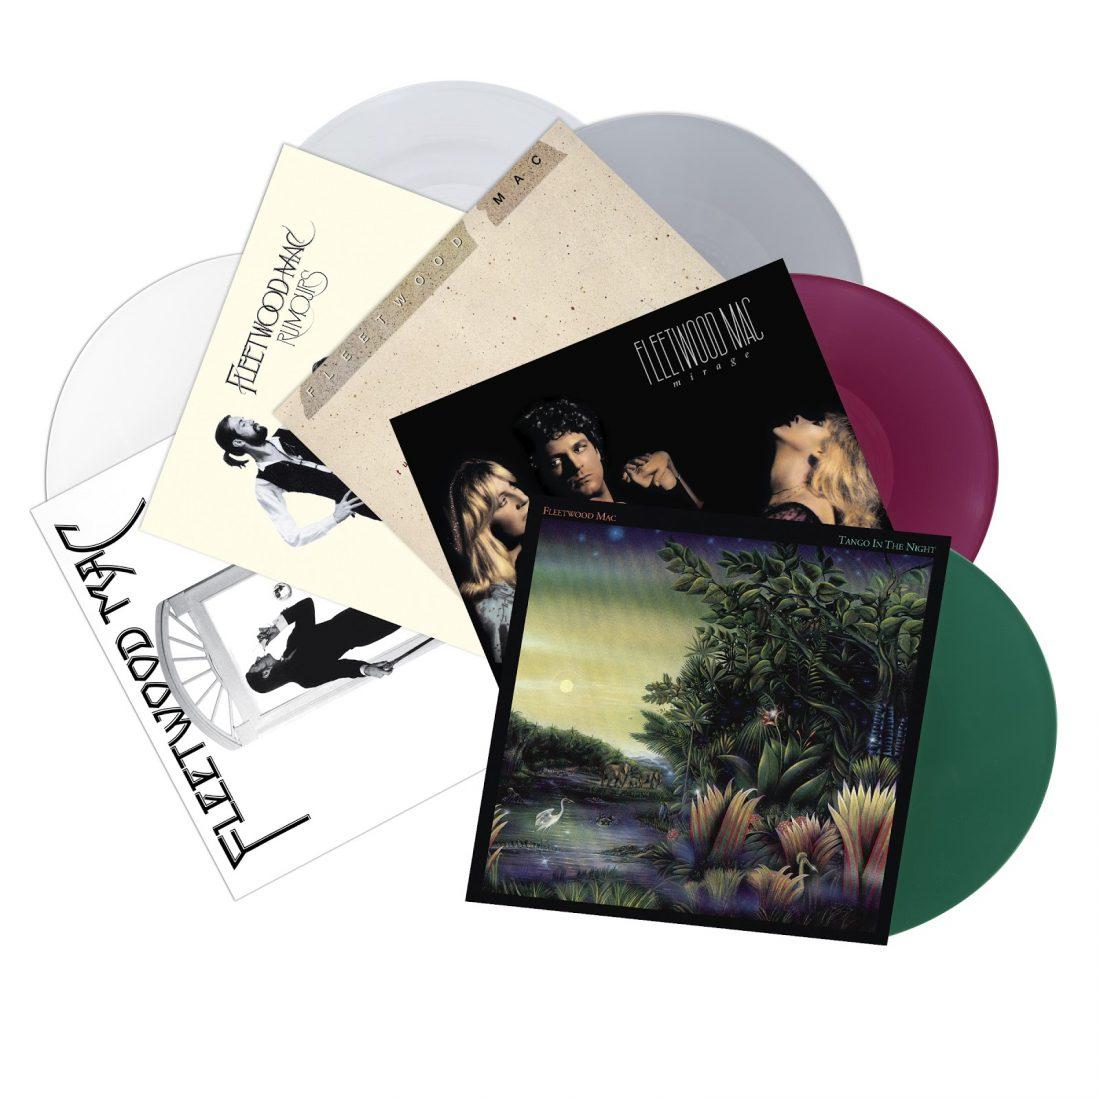 Limited Edition Fleetwood Mac